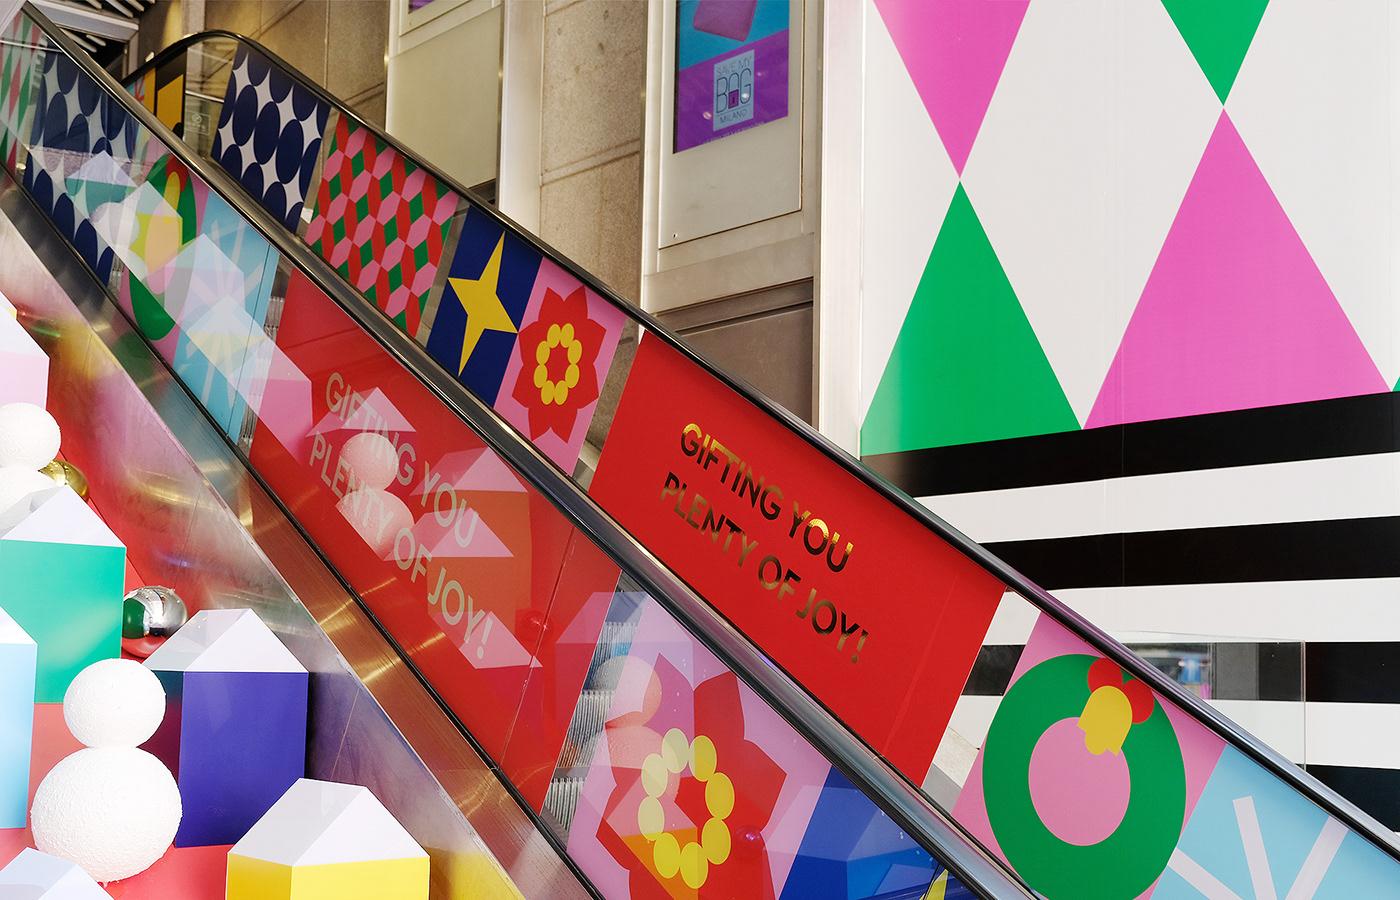 sogo department store xmas santa pattern Colourful  vm Window Display decoration simple